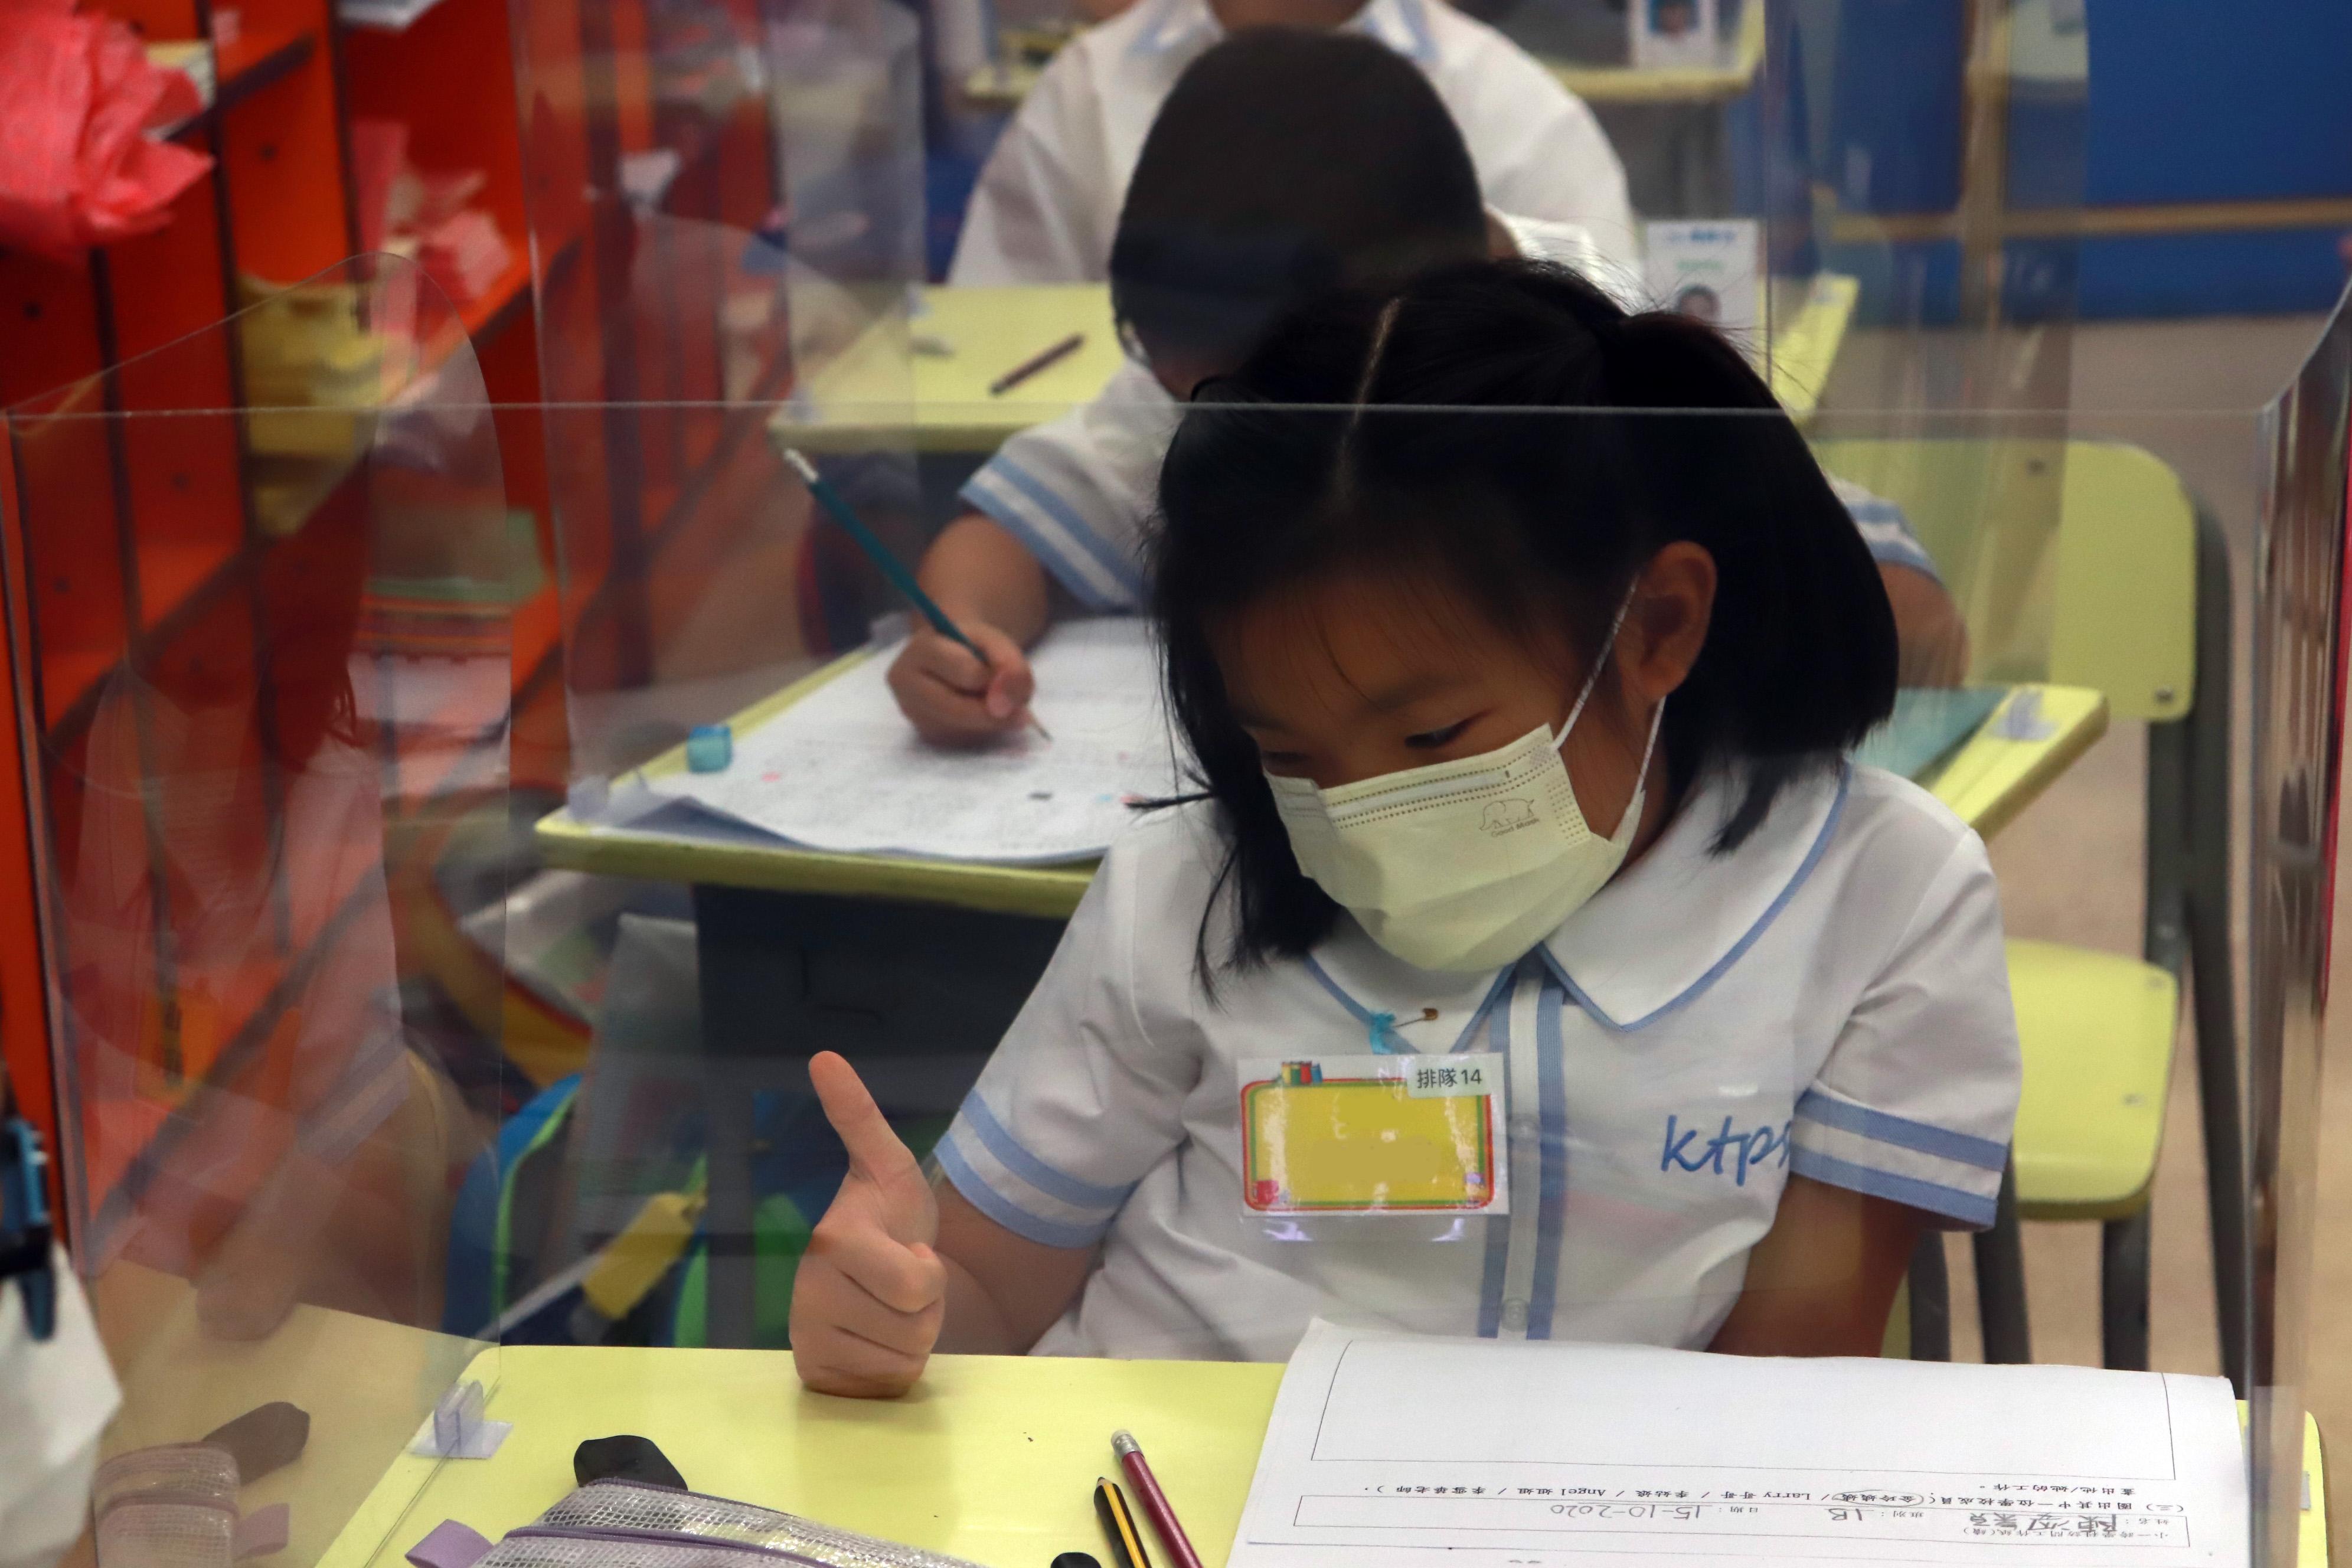 http://keito.school.hk/sites/default/files/img_6733.jpg